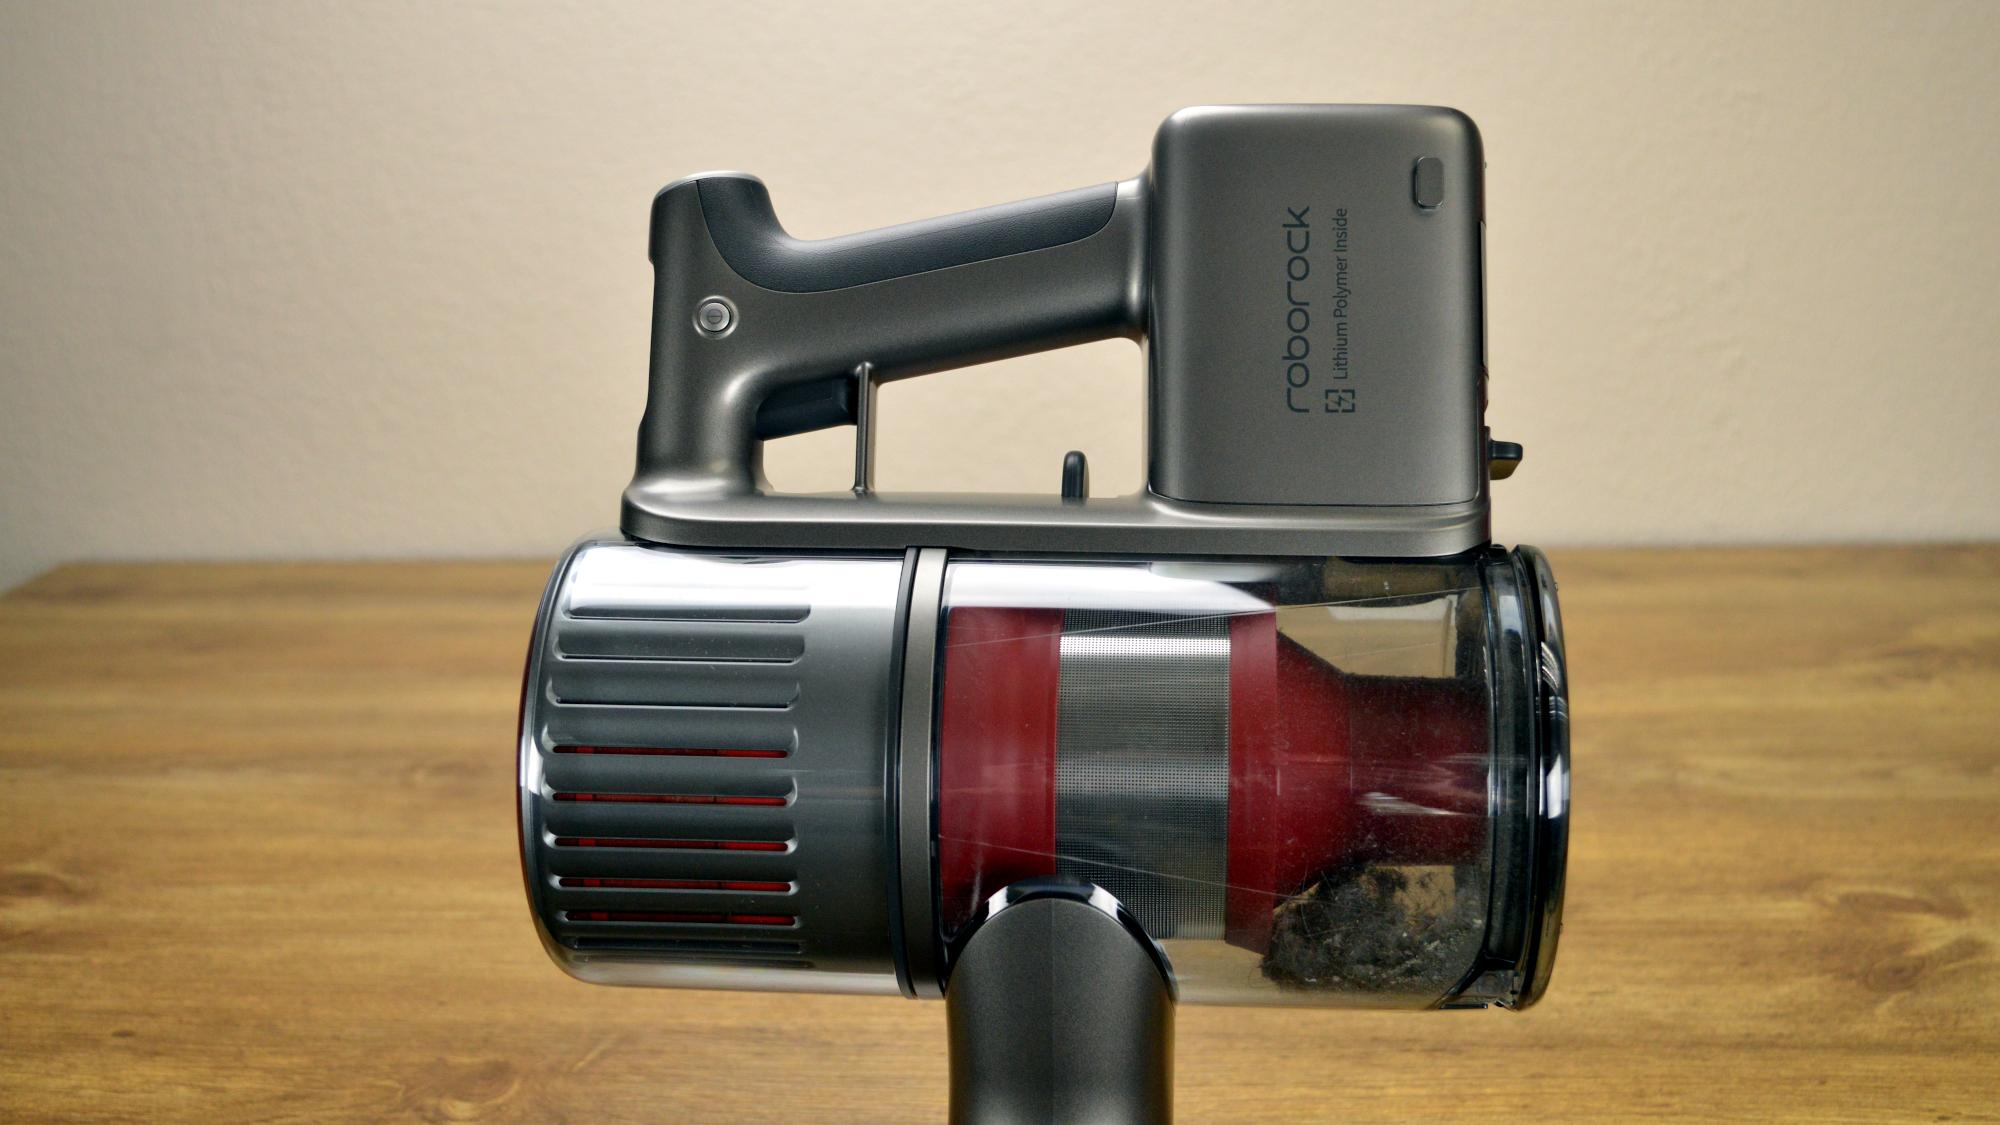 Roborock H7 Cordless Vacuum Side